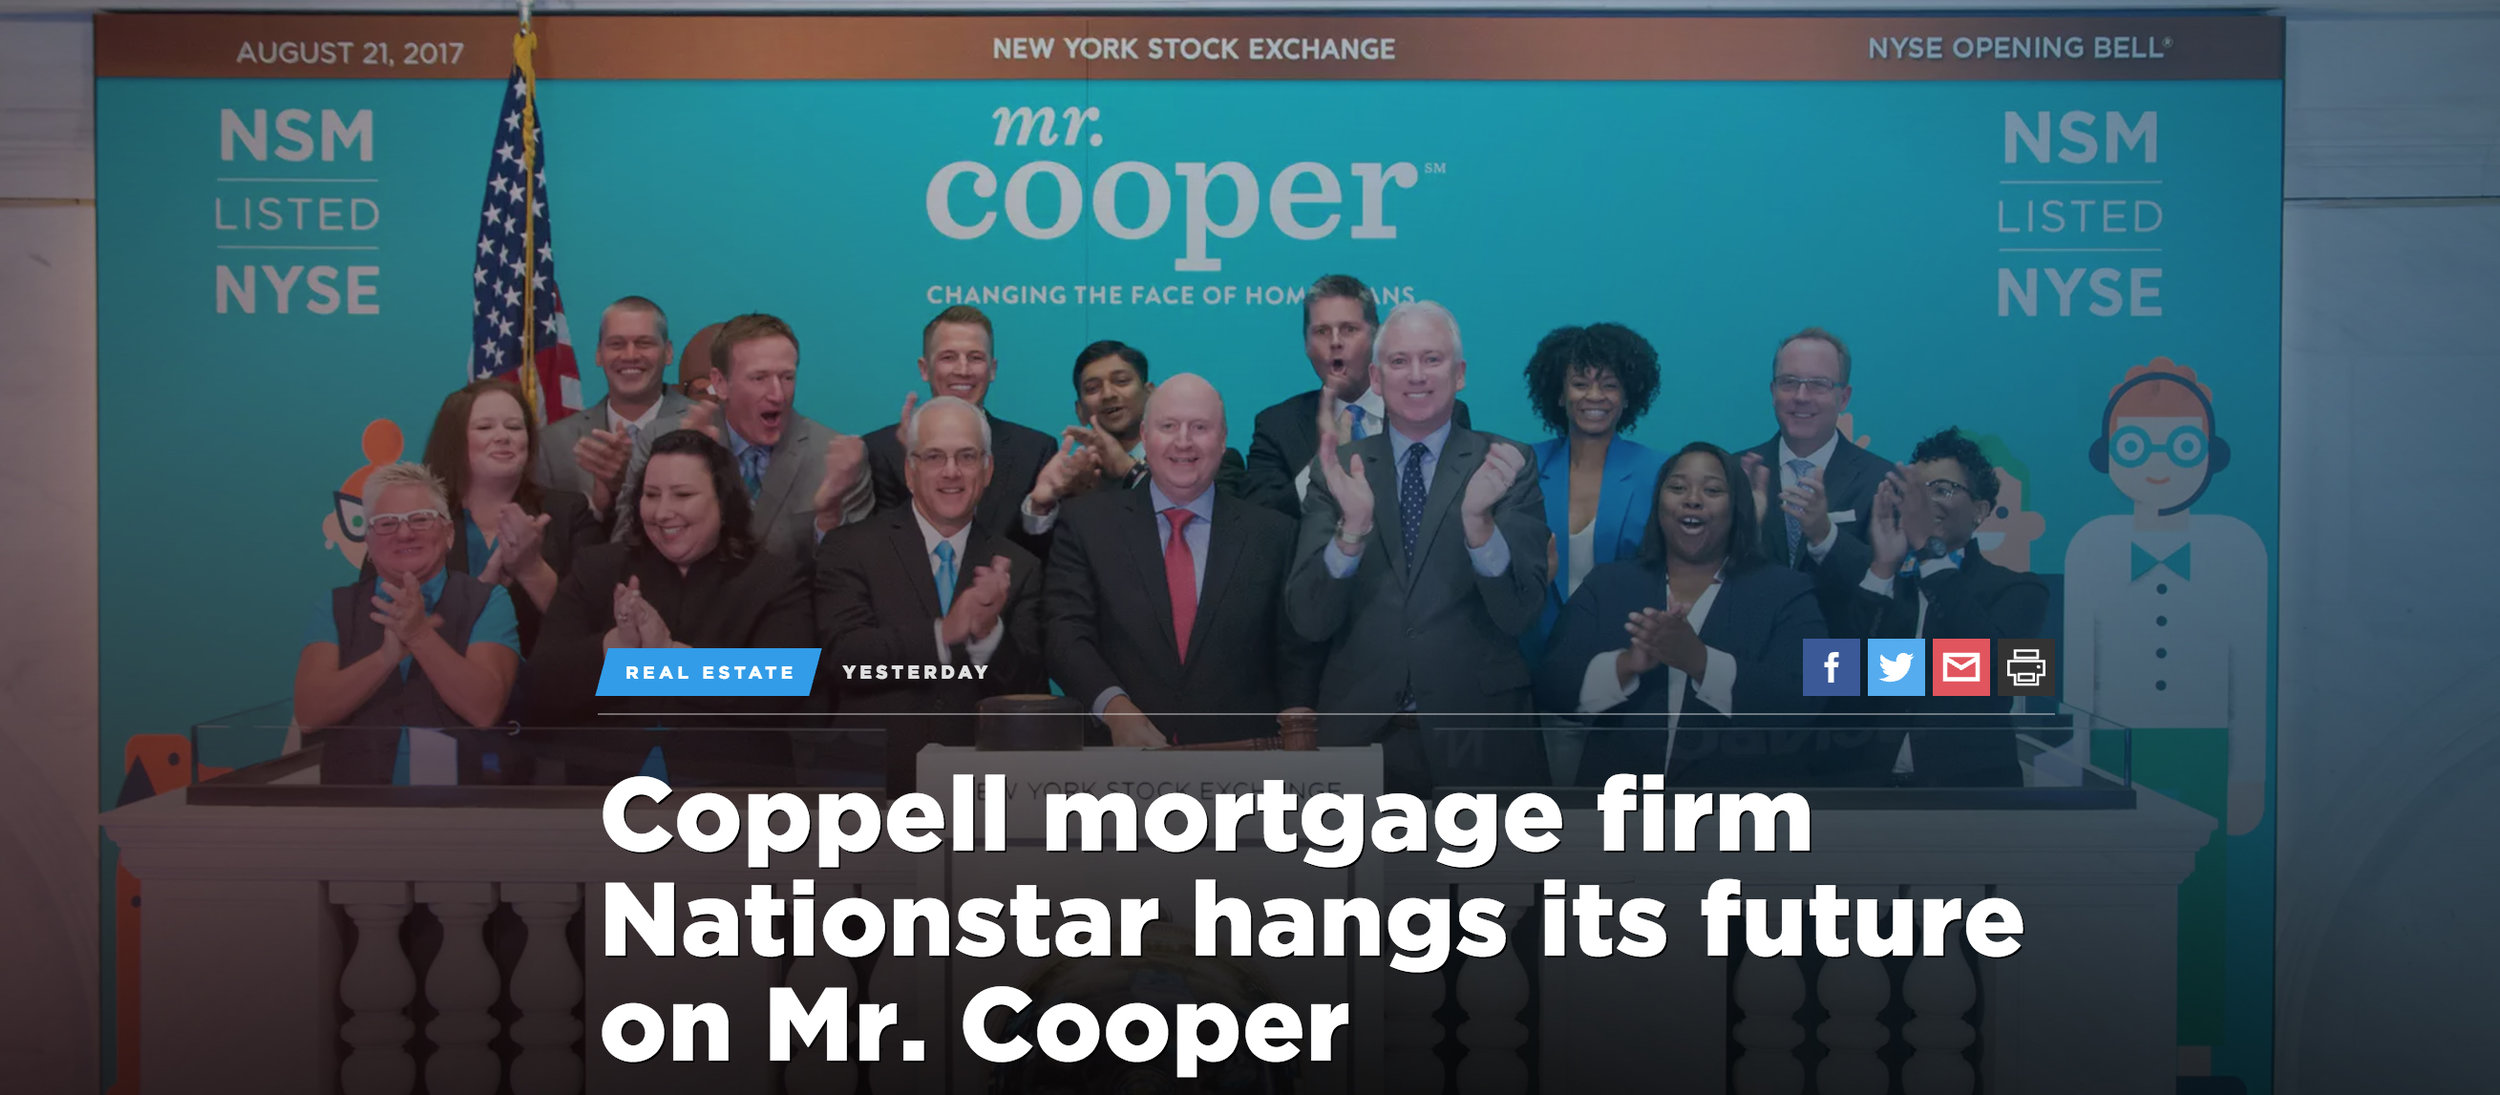 Cooper NYSE Cropped.jpg